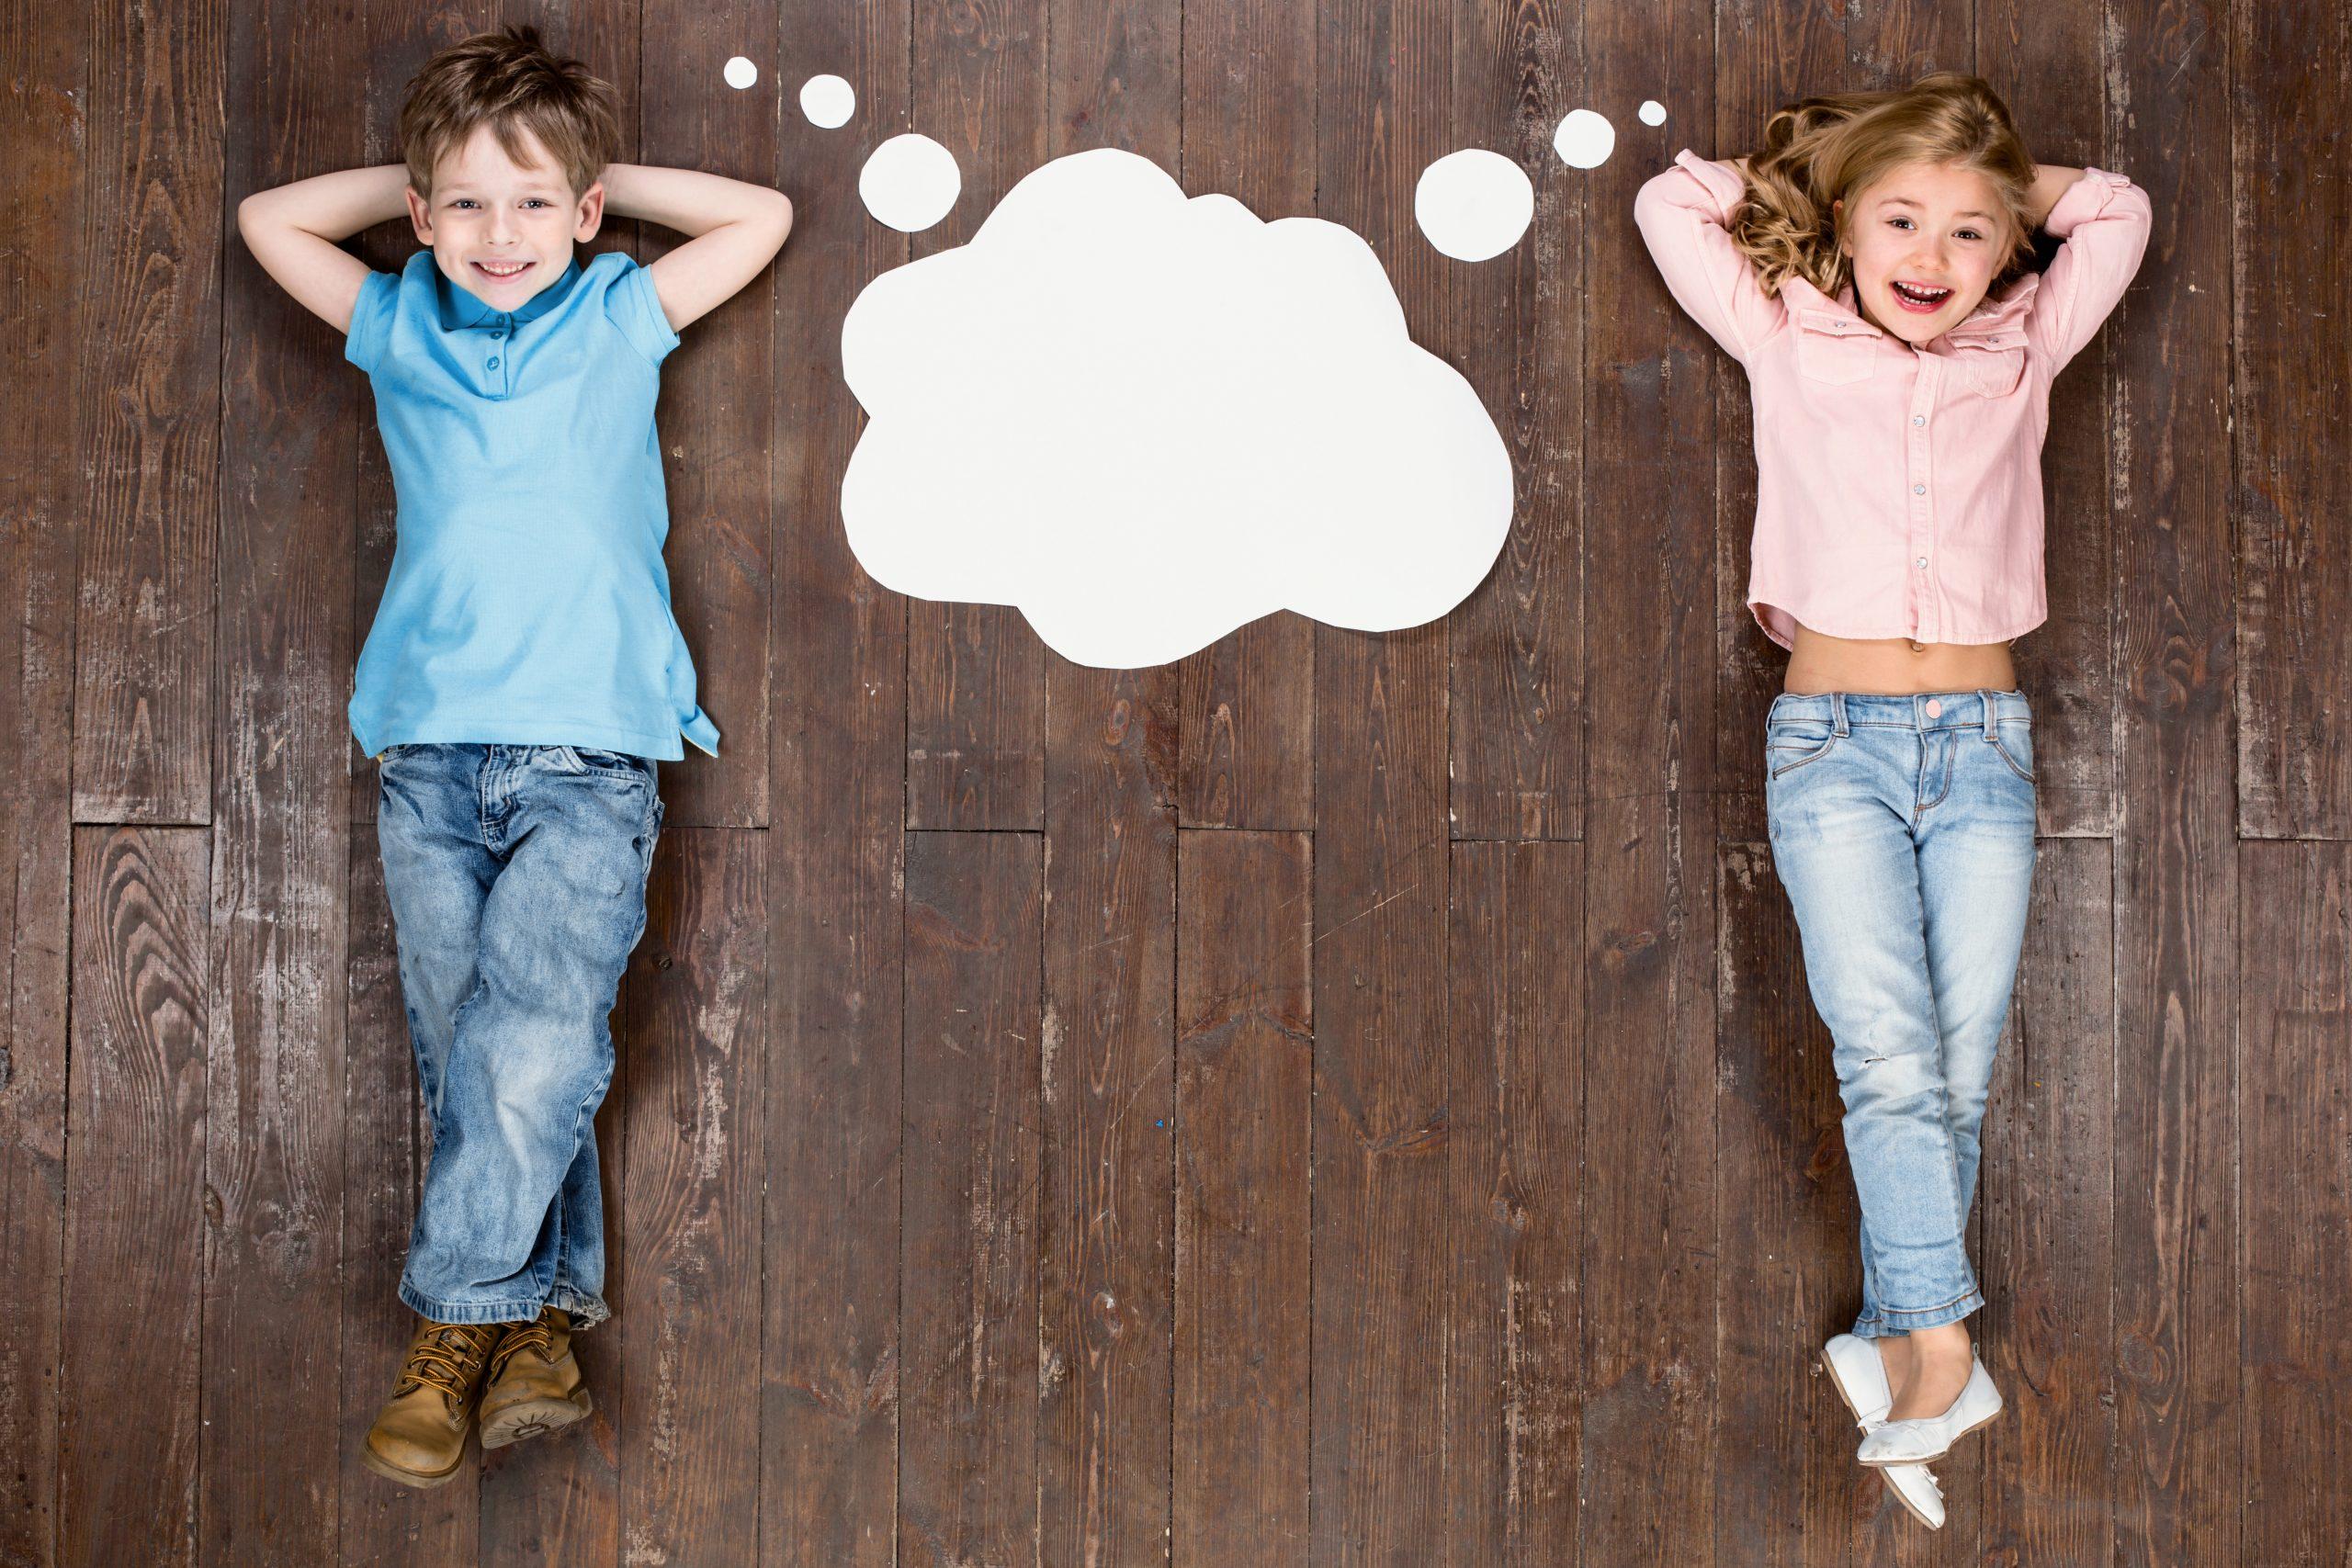 Upsoftskills - Empathy course for kids